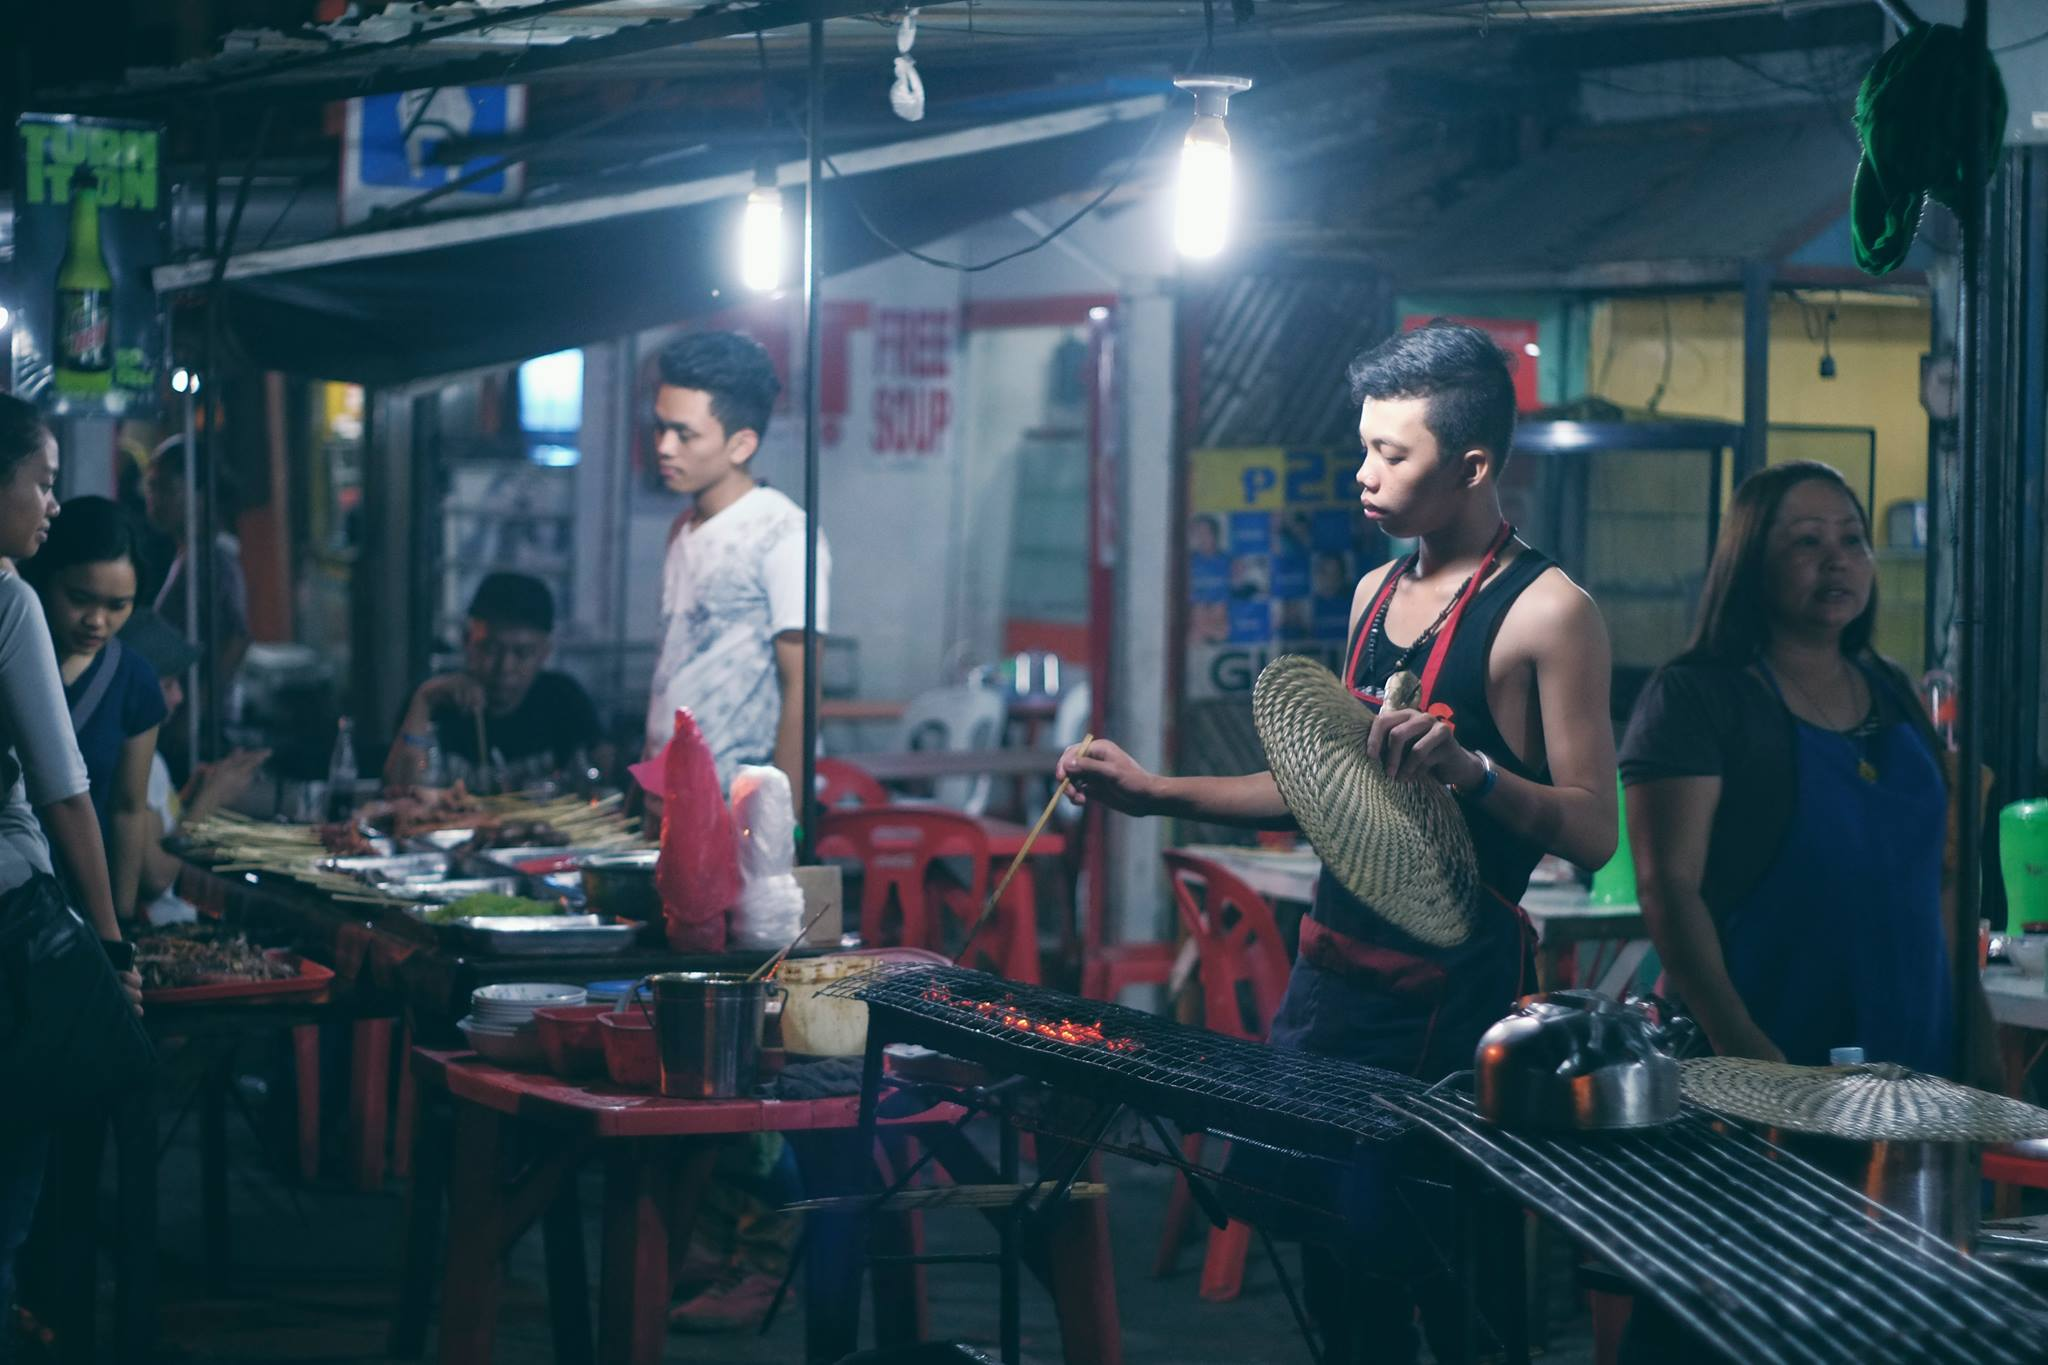 ROXAS NIGHT MARKET. The night market was every Davaoeño's happy place. Photo courtesy of Karlu Tayabas